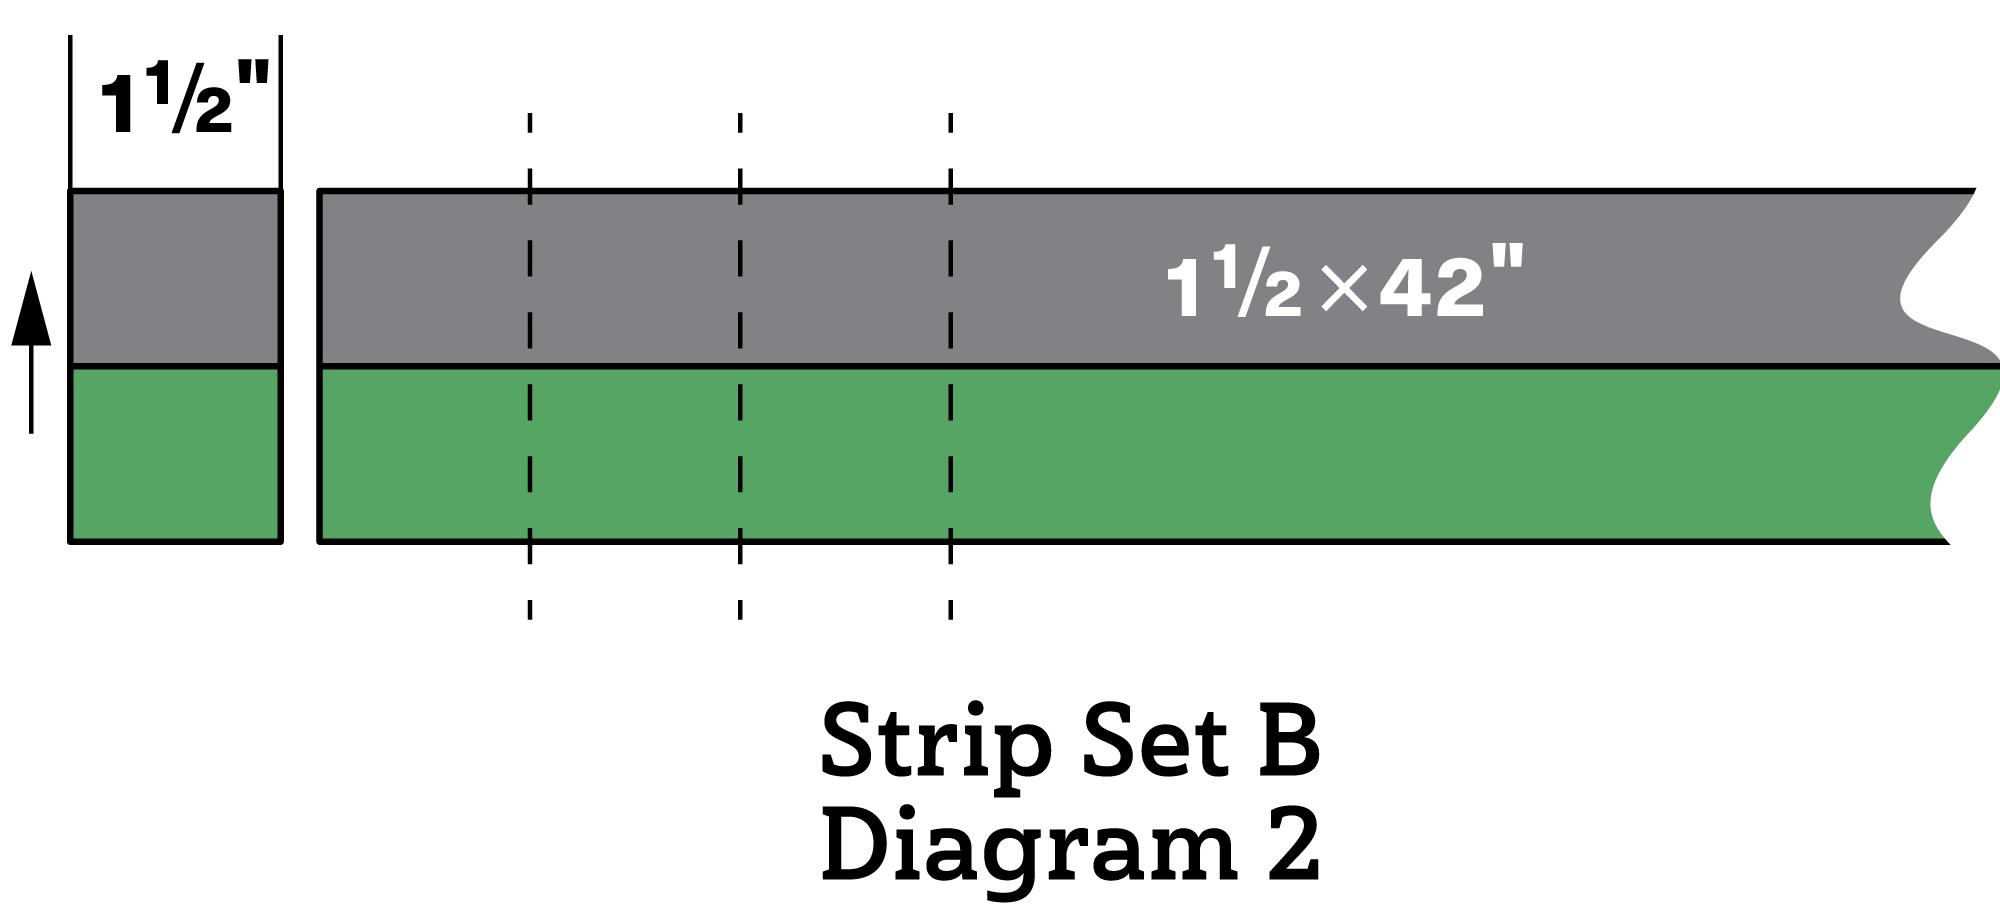 Good Tidings diagram 2